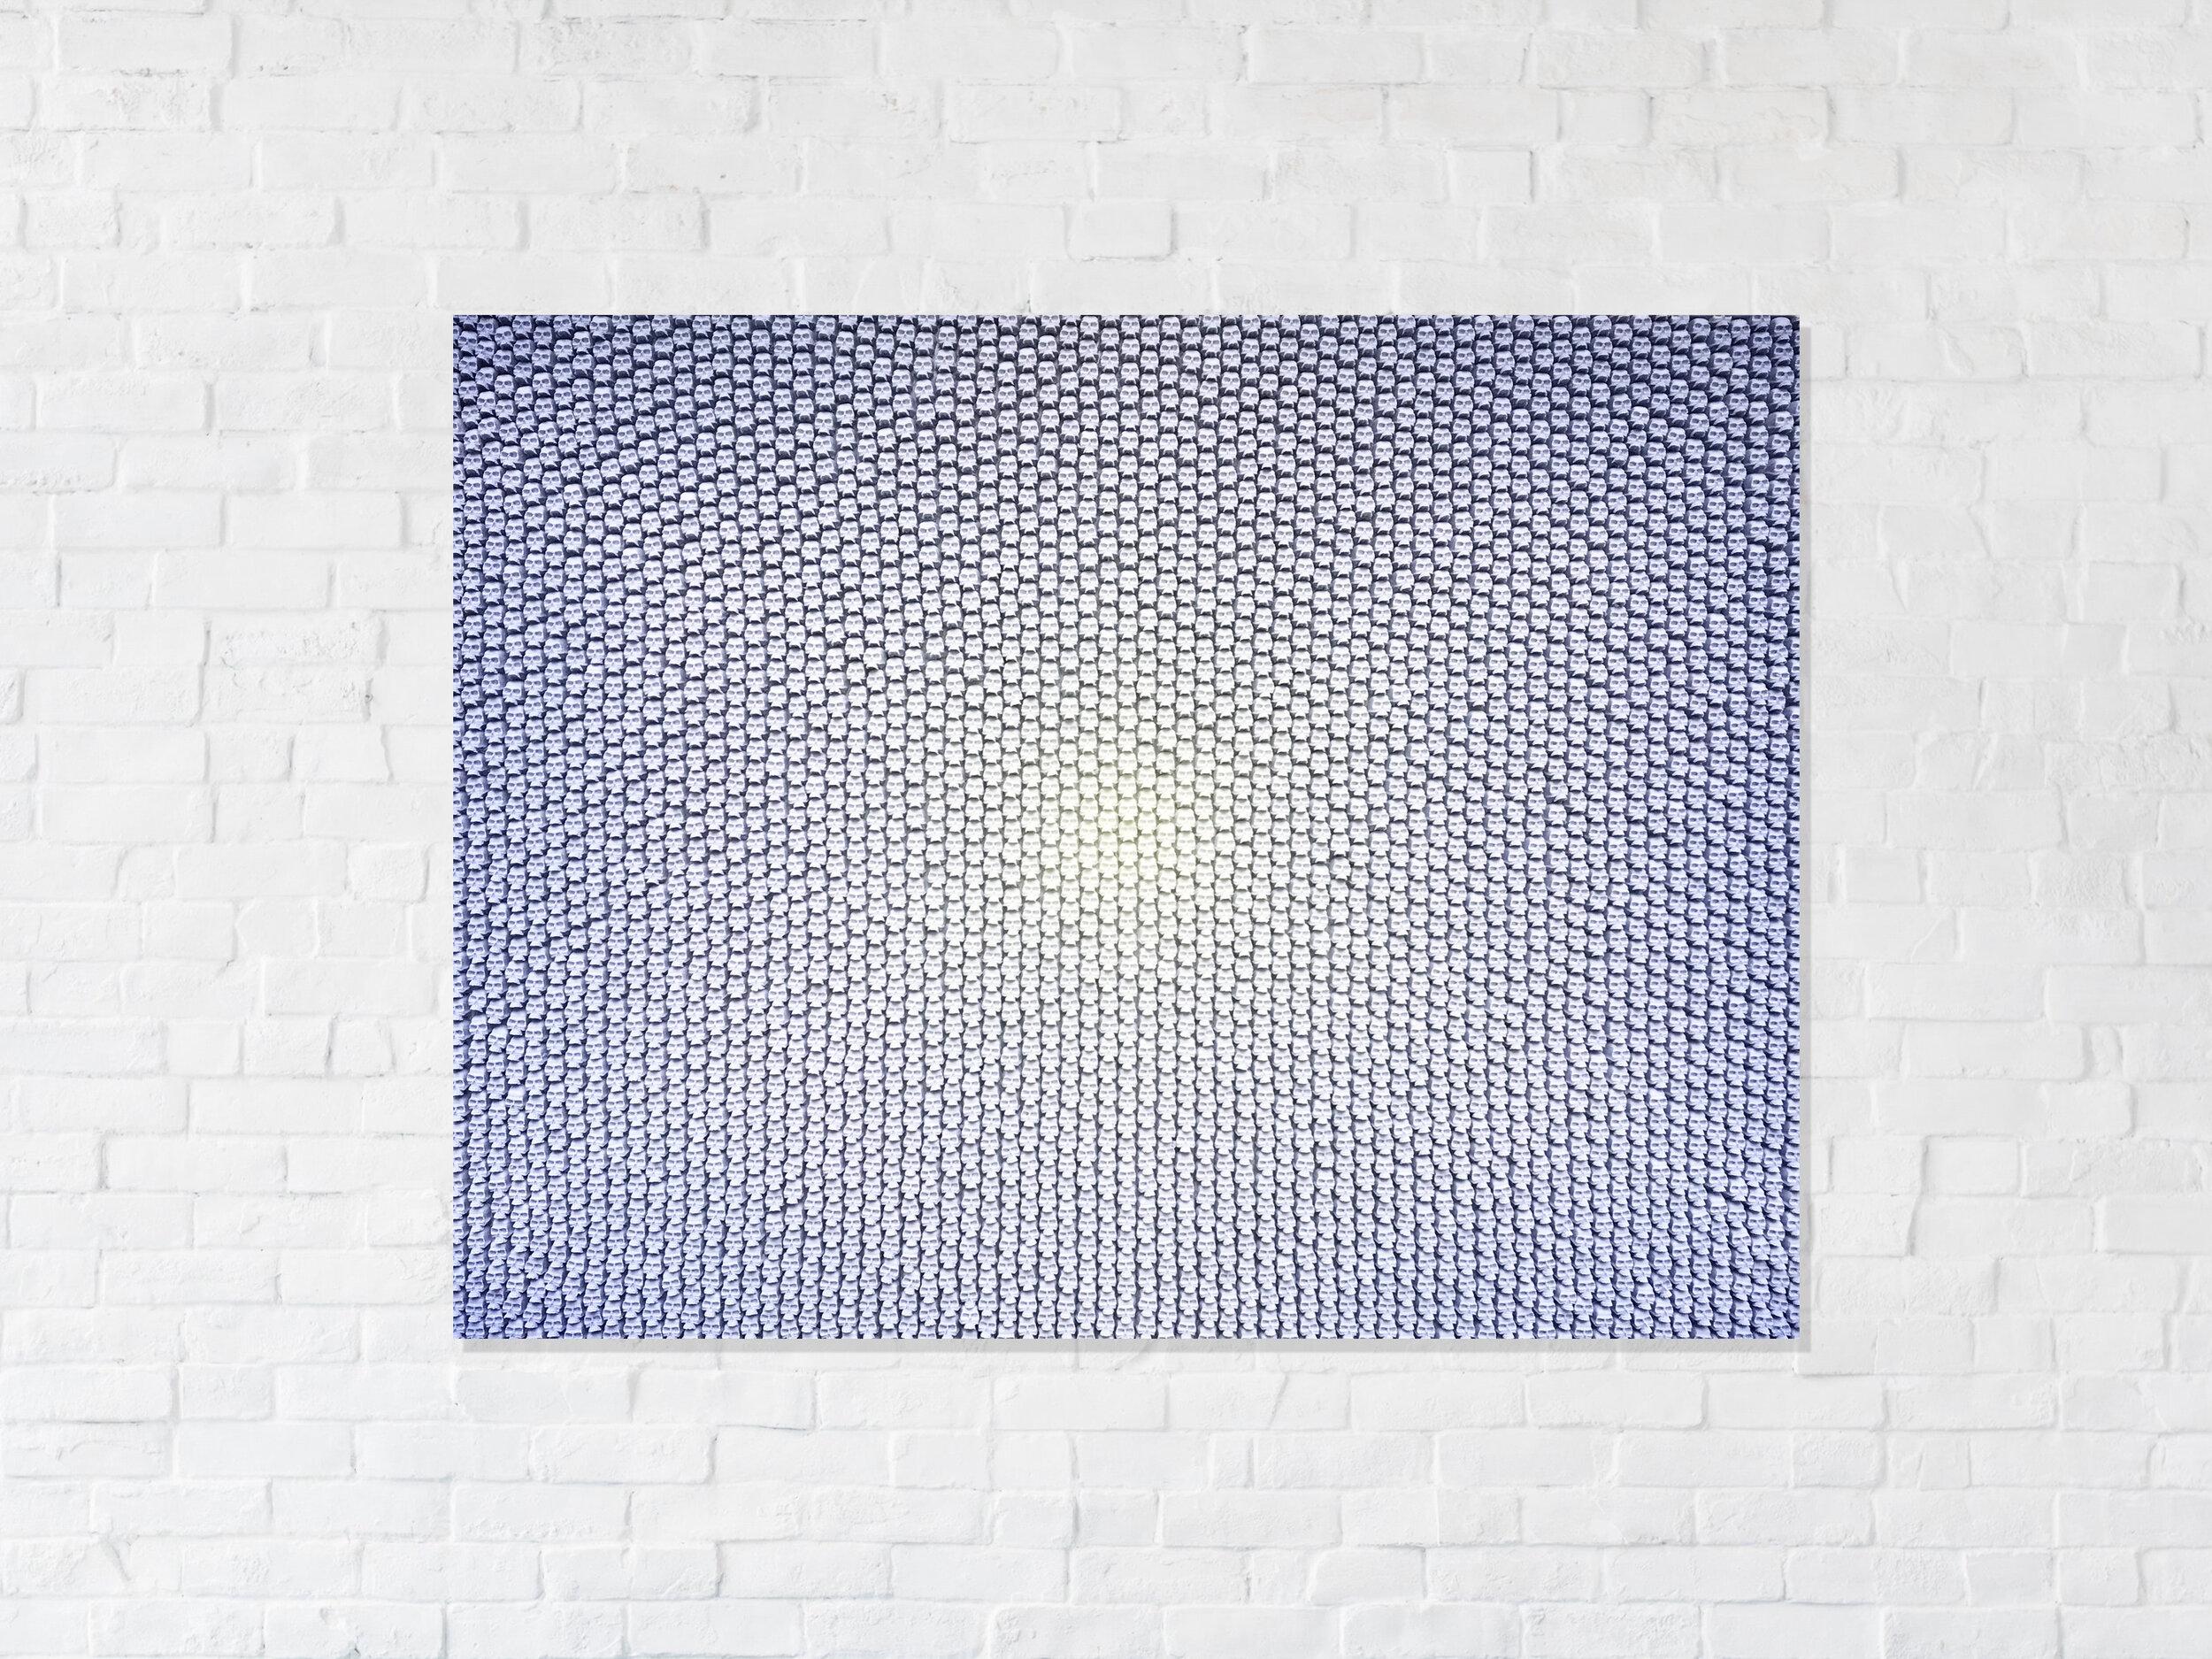 fifty shades - lavender - 4,500 hand cast skulls